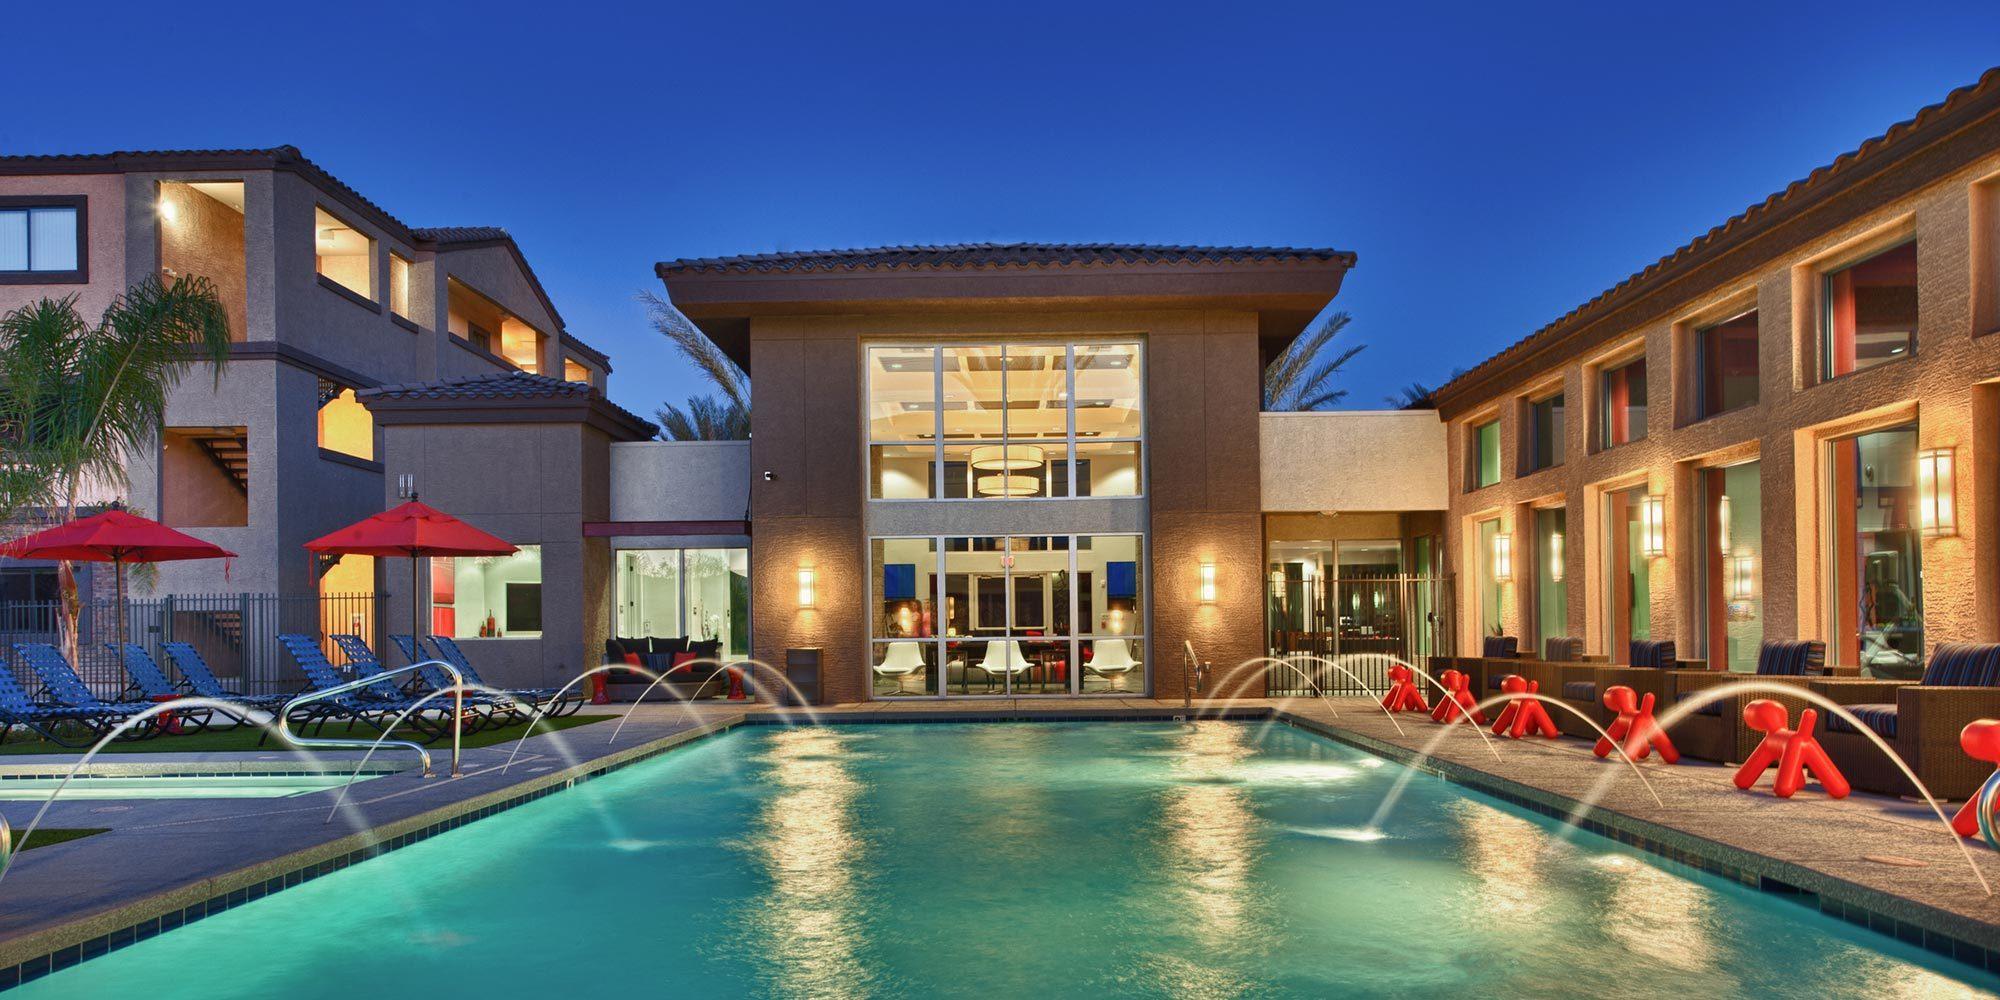 Luxury apartments in Phoenix AZ